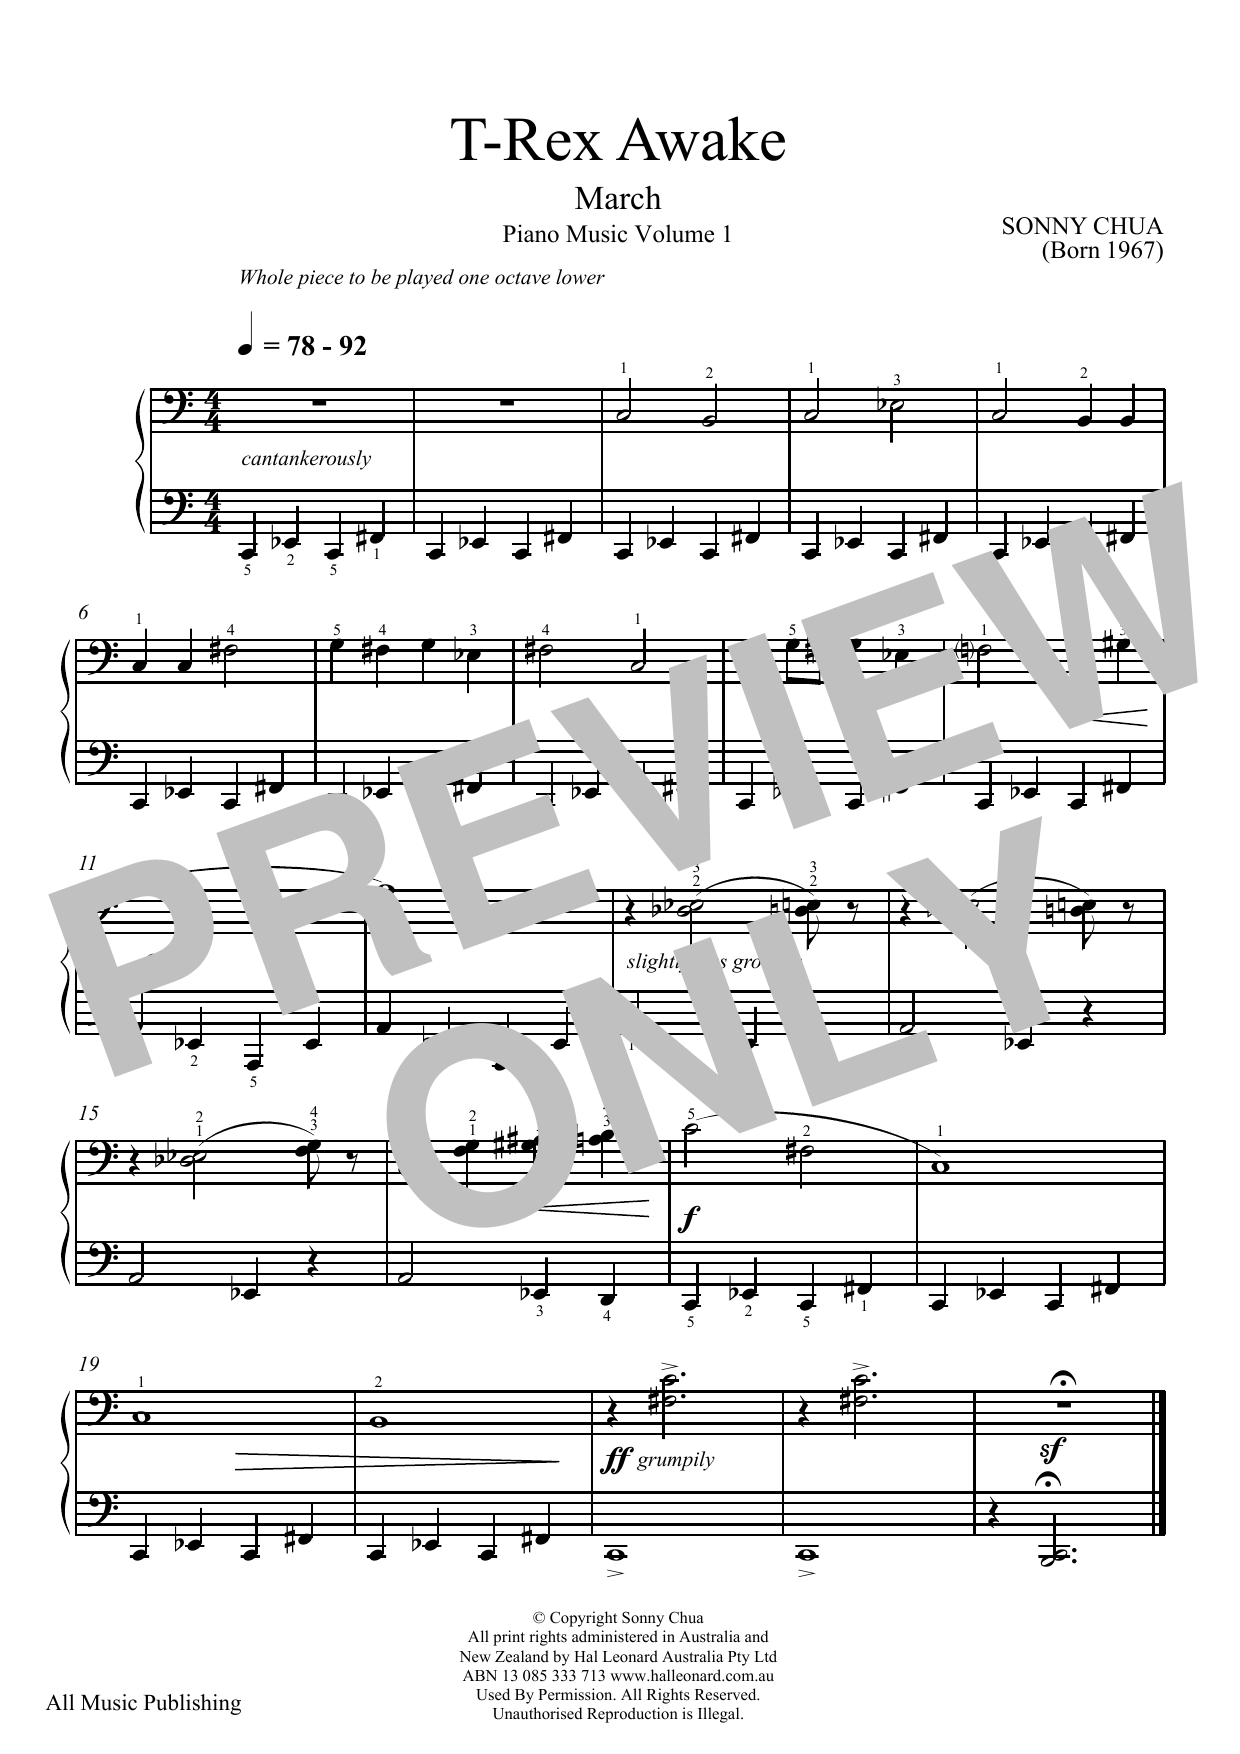 T-Rex Awake (From Piano Music Vol 1) (Piano Solo) - Print Sheet Music